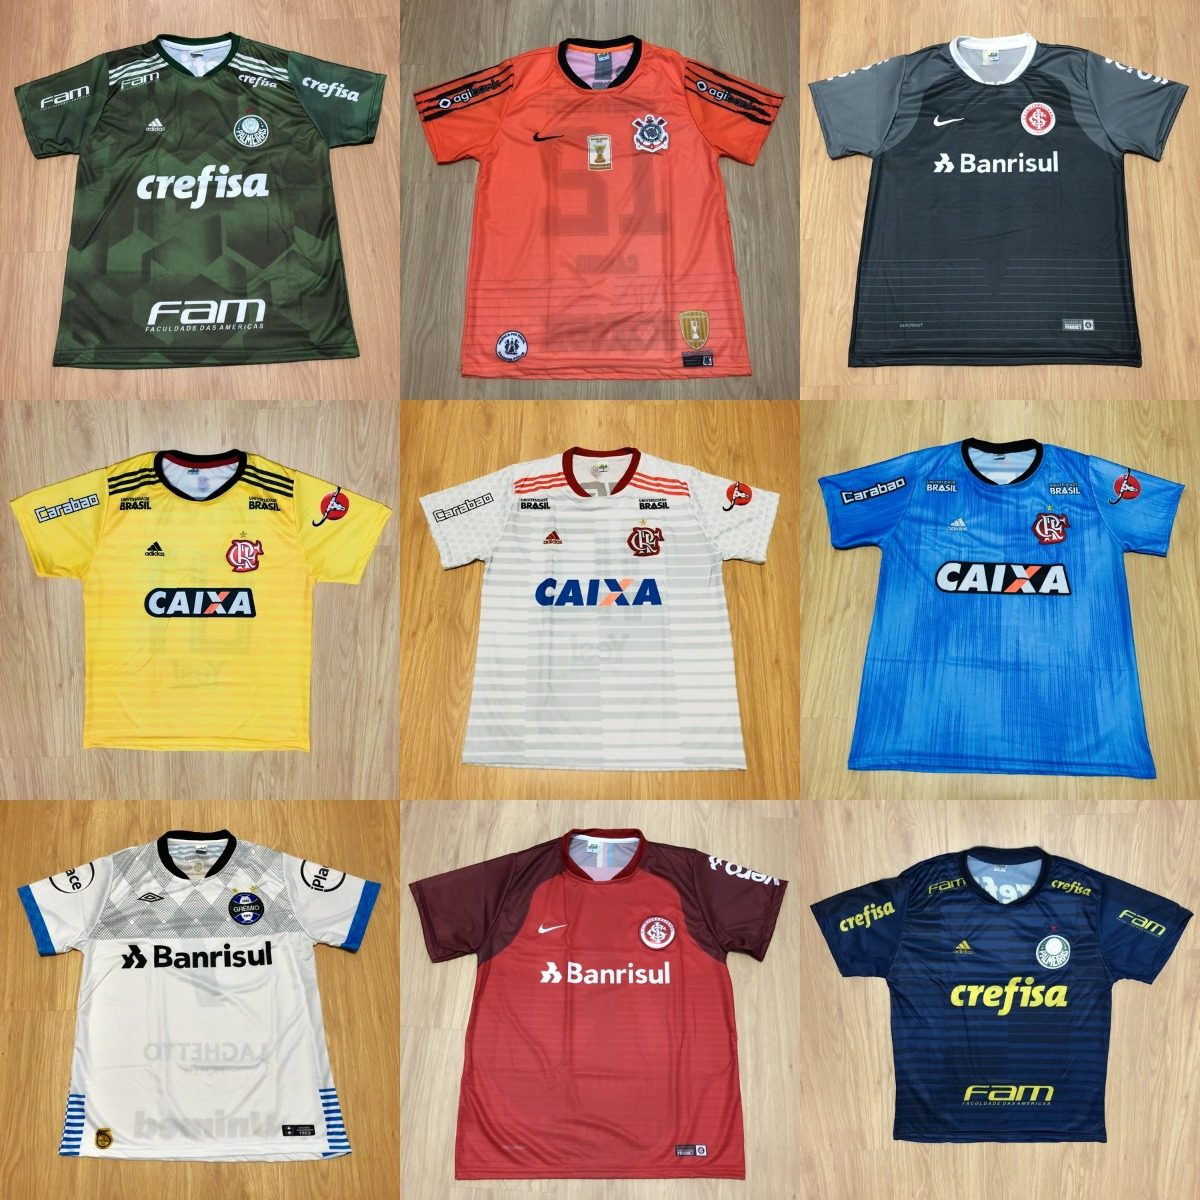 Kit 7 Camisas Futebol 100 Modelos Diferentes 2018 Atacado - R  147 ... 933328349f7bc